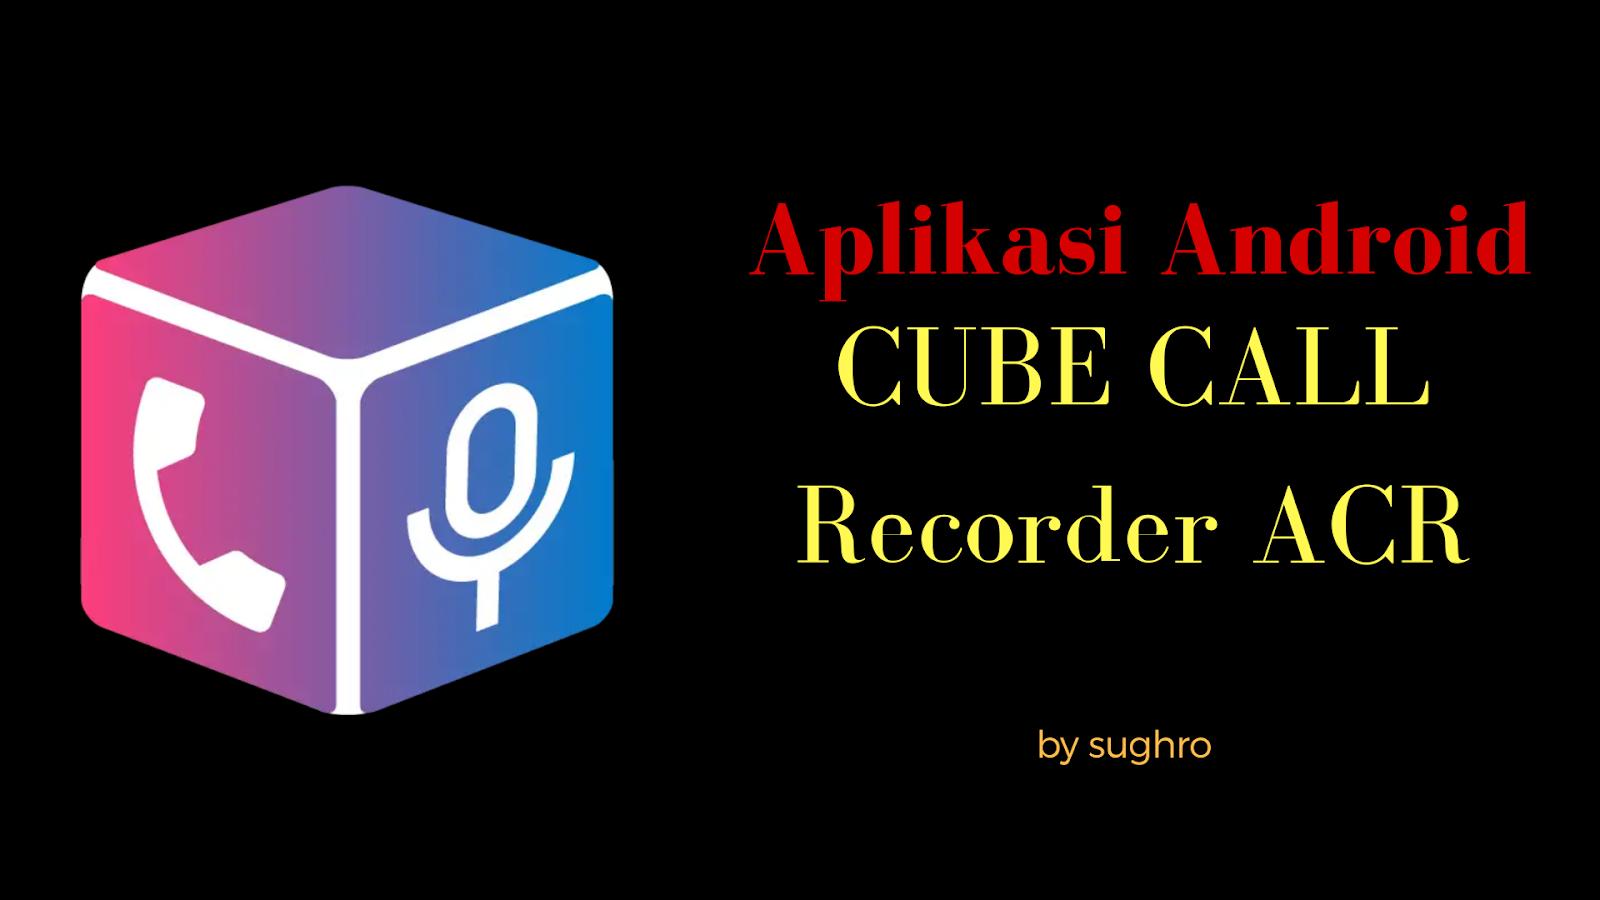 Aplikasi Android - Cube Call Recorder ACR - Ahmad Sughro